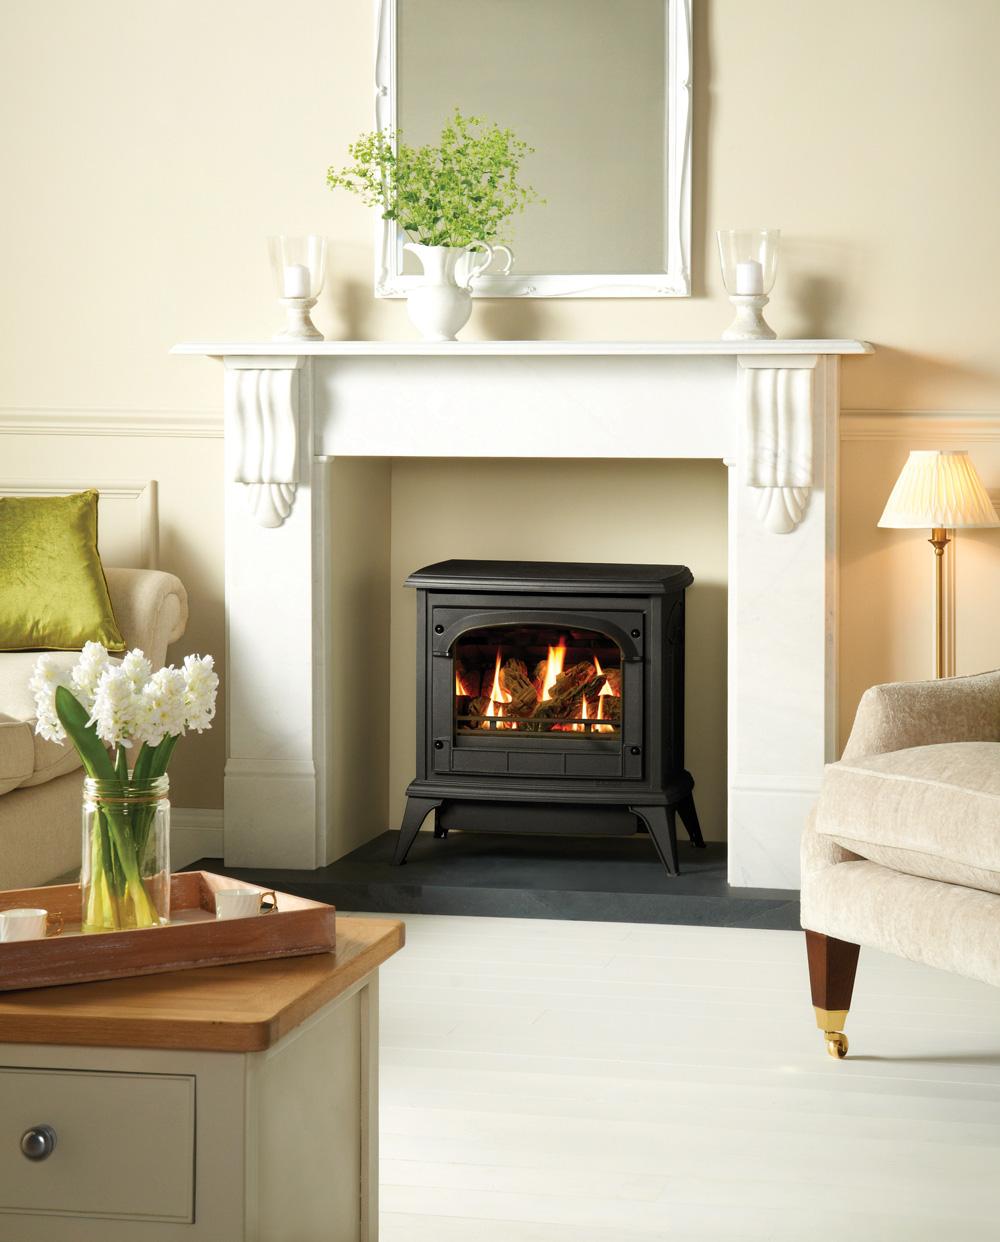 clarendon gas stoves gazco traditional stoves. Black Bedroom Furniture Sets. Home Design Ideas